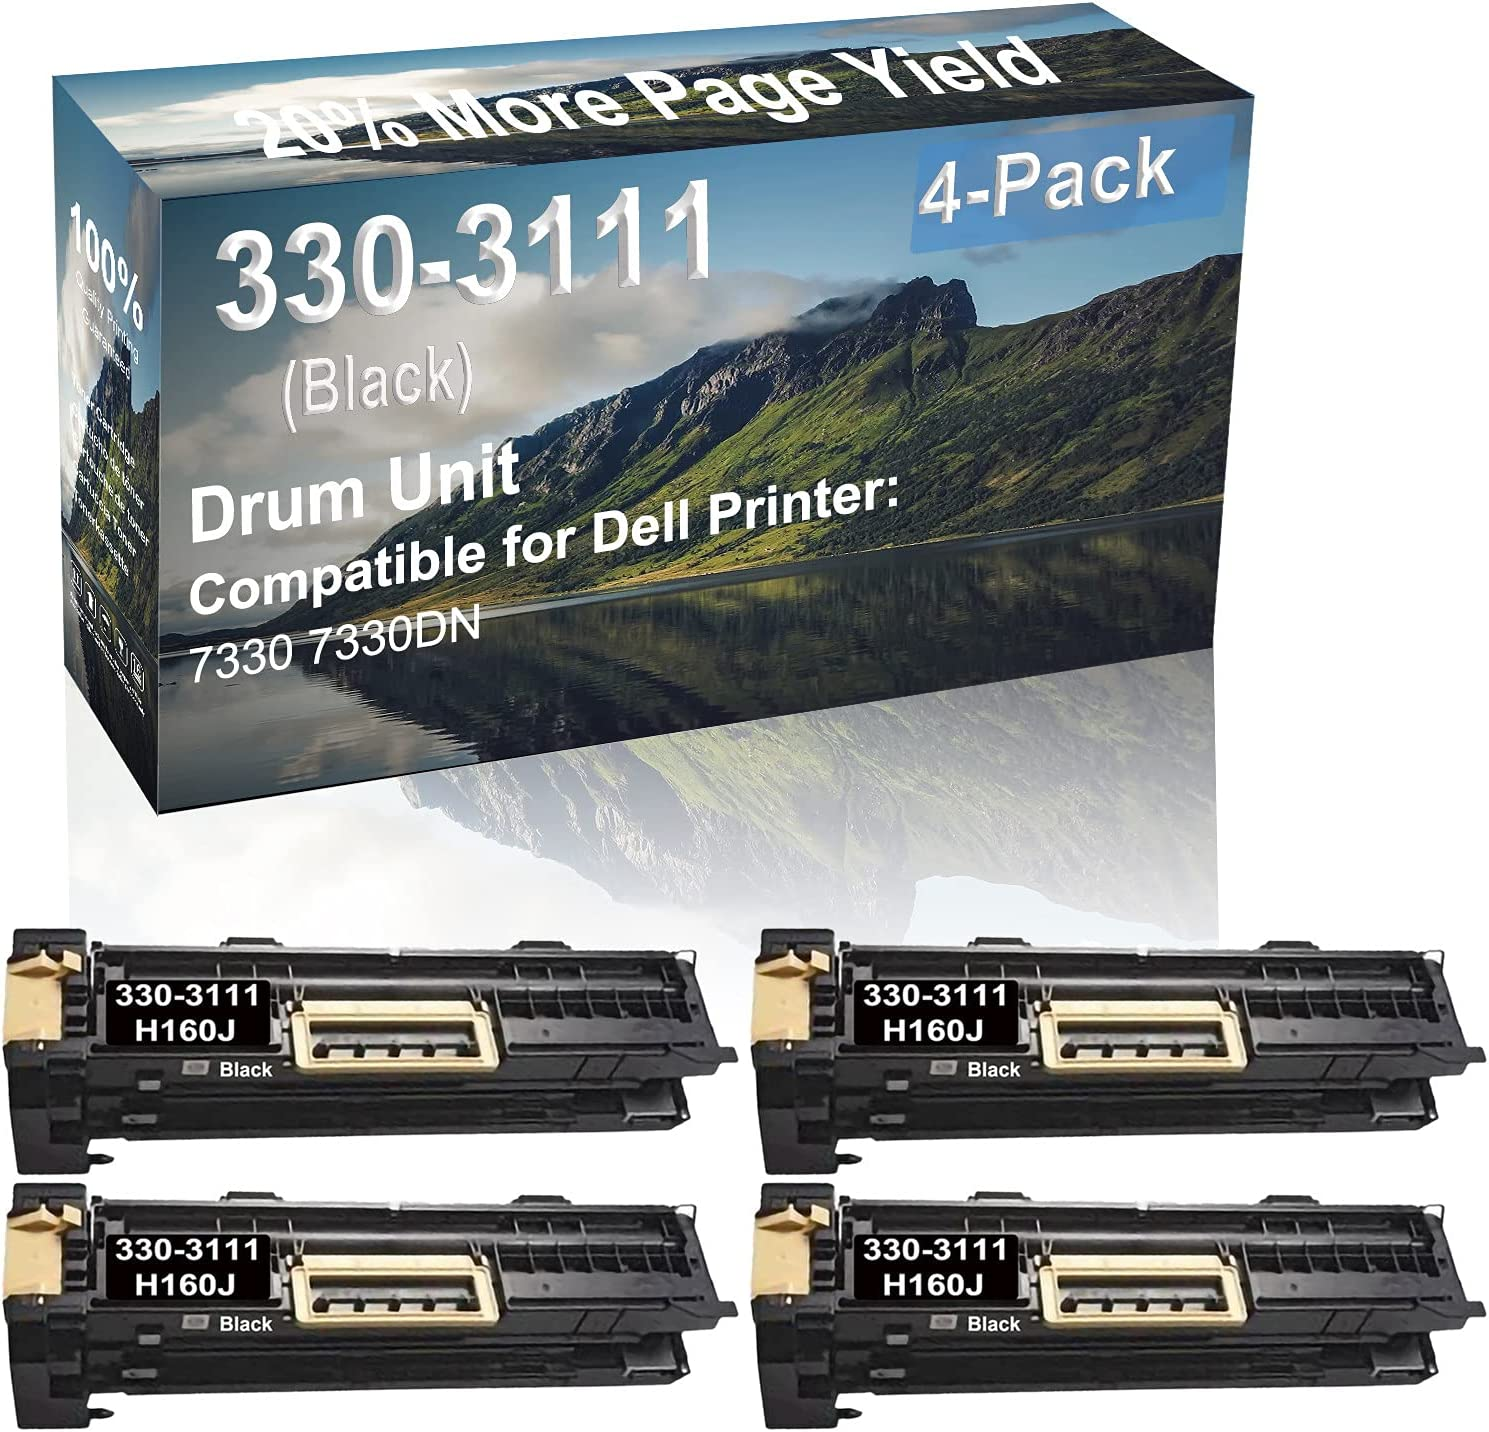 4-Pack (Black) Compatible 7330 7330DN Printer Drum Unit Replacement for Dell 330-3111 H160J Drum Kit